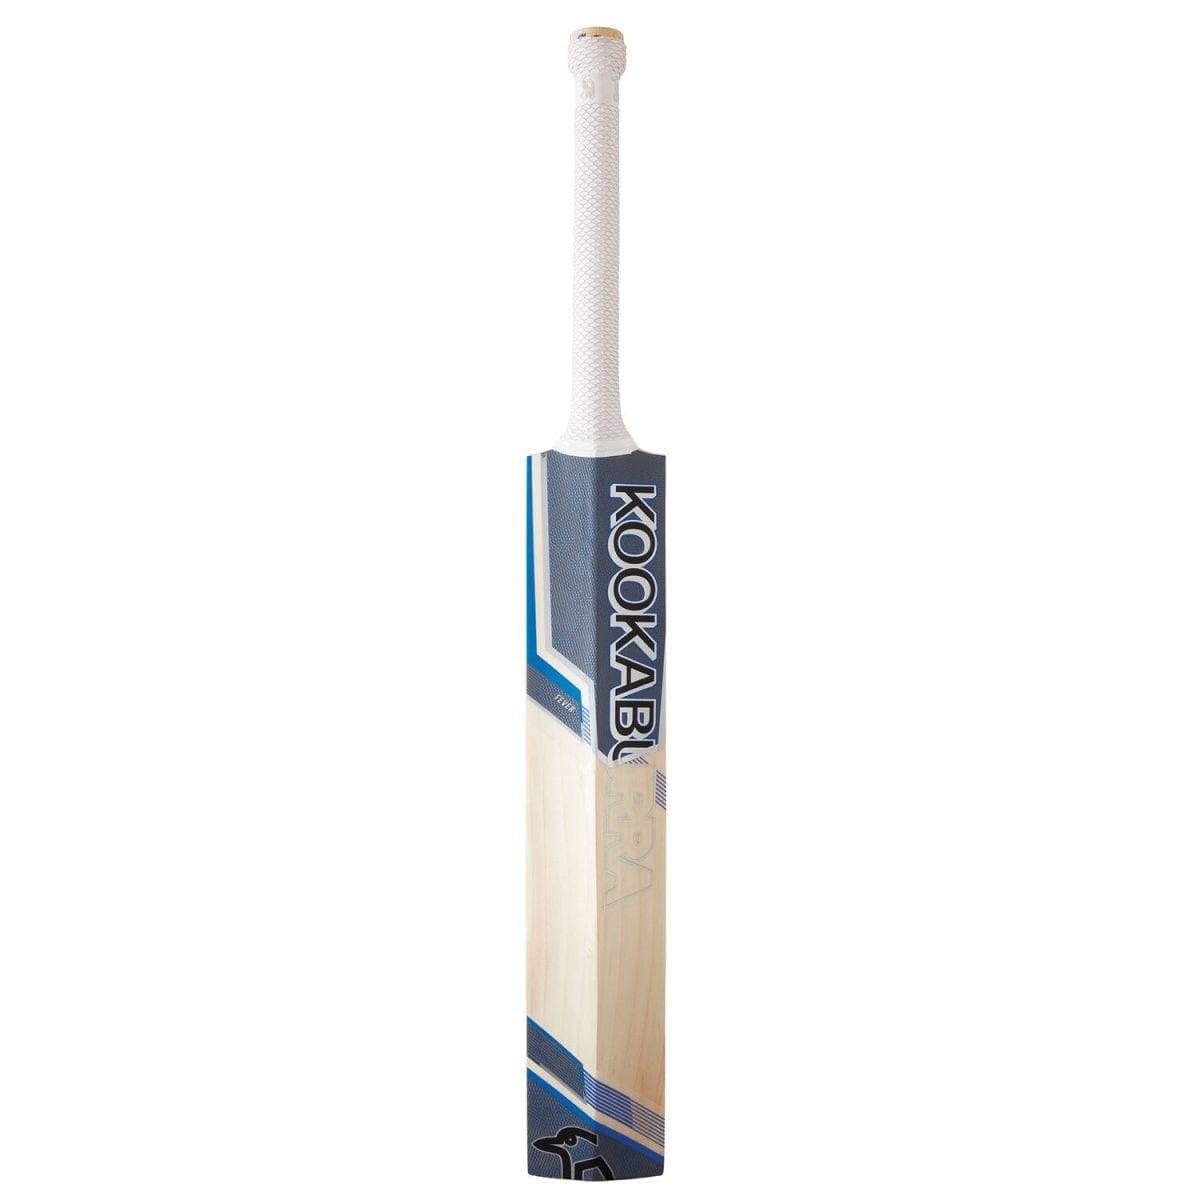 Kookaburra Cricket Baseball Cap 2019 Range